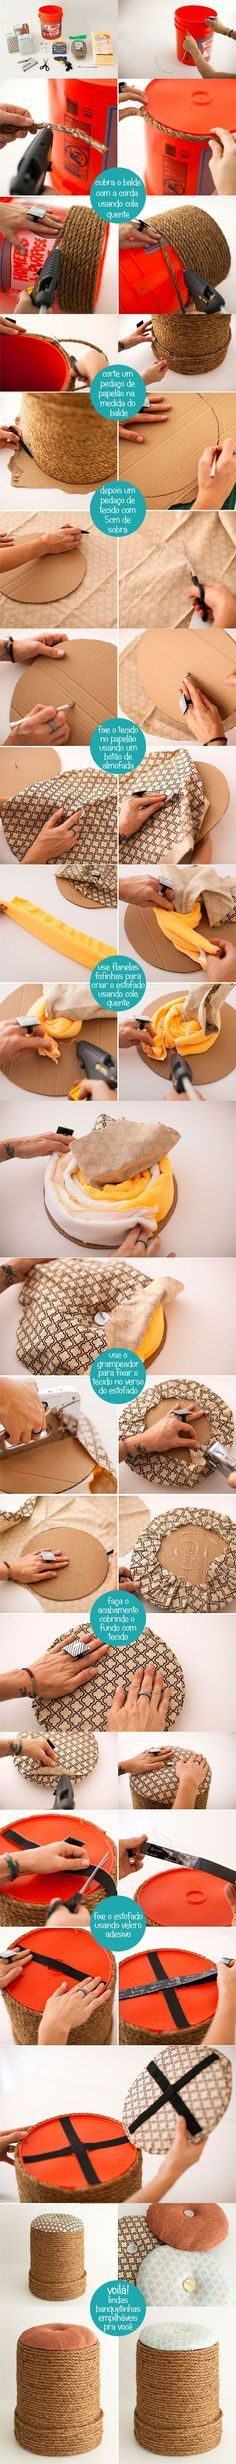 DIY – Passo a Passo: Baldes de plástico viram banquetas. |